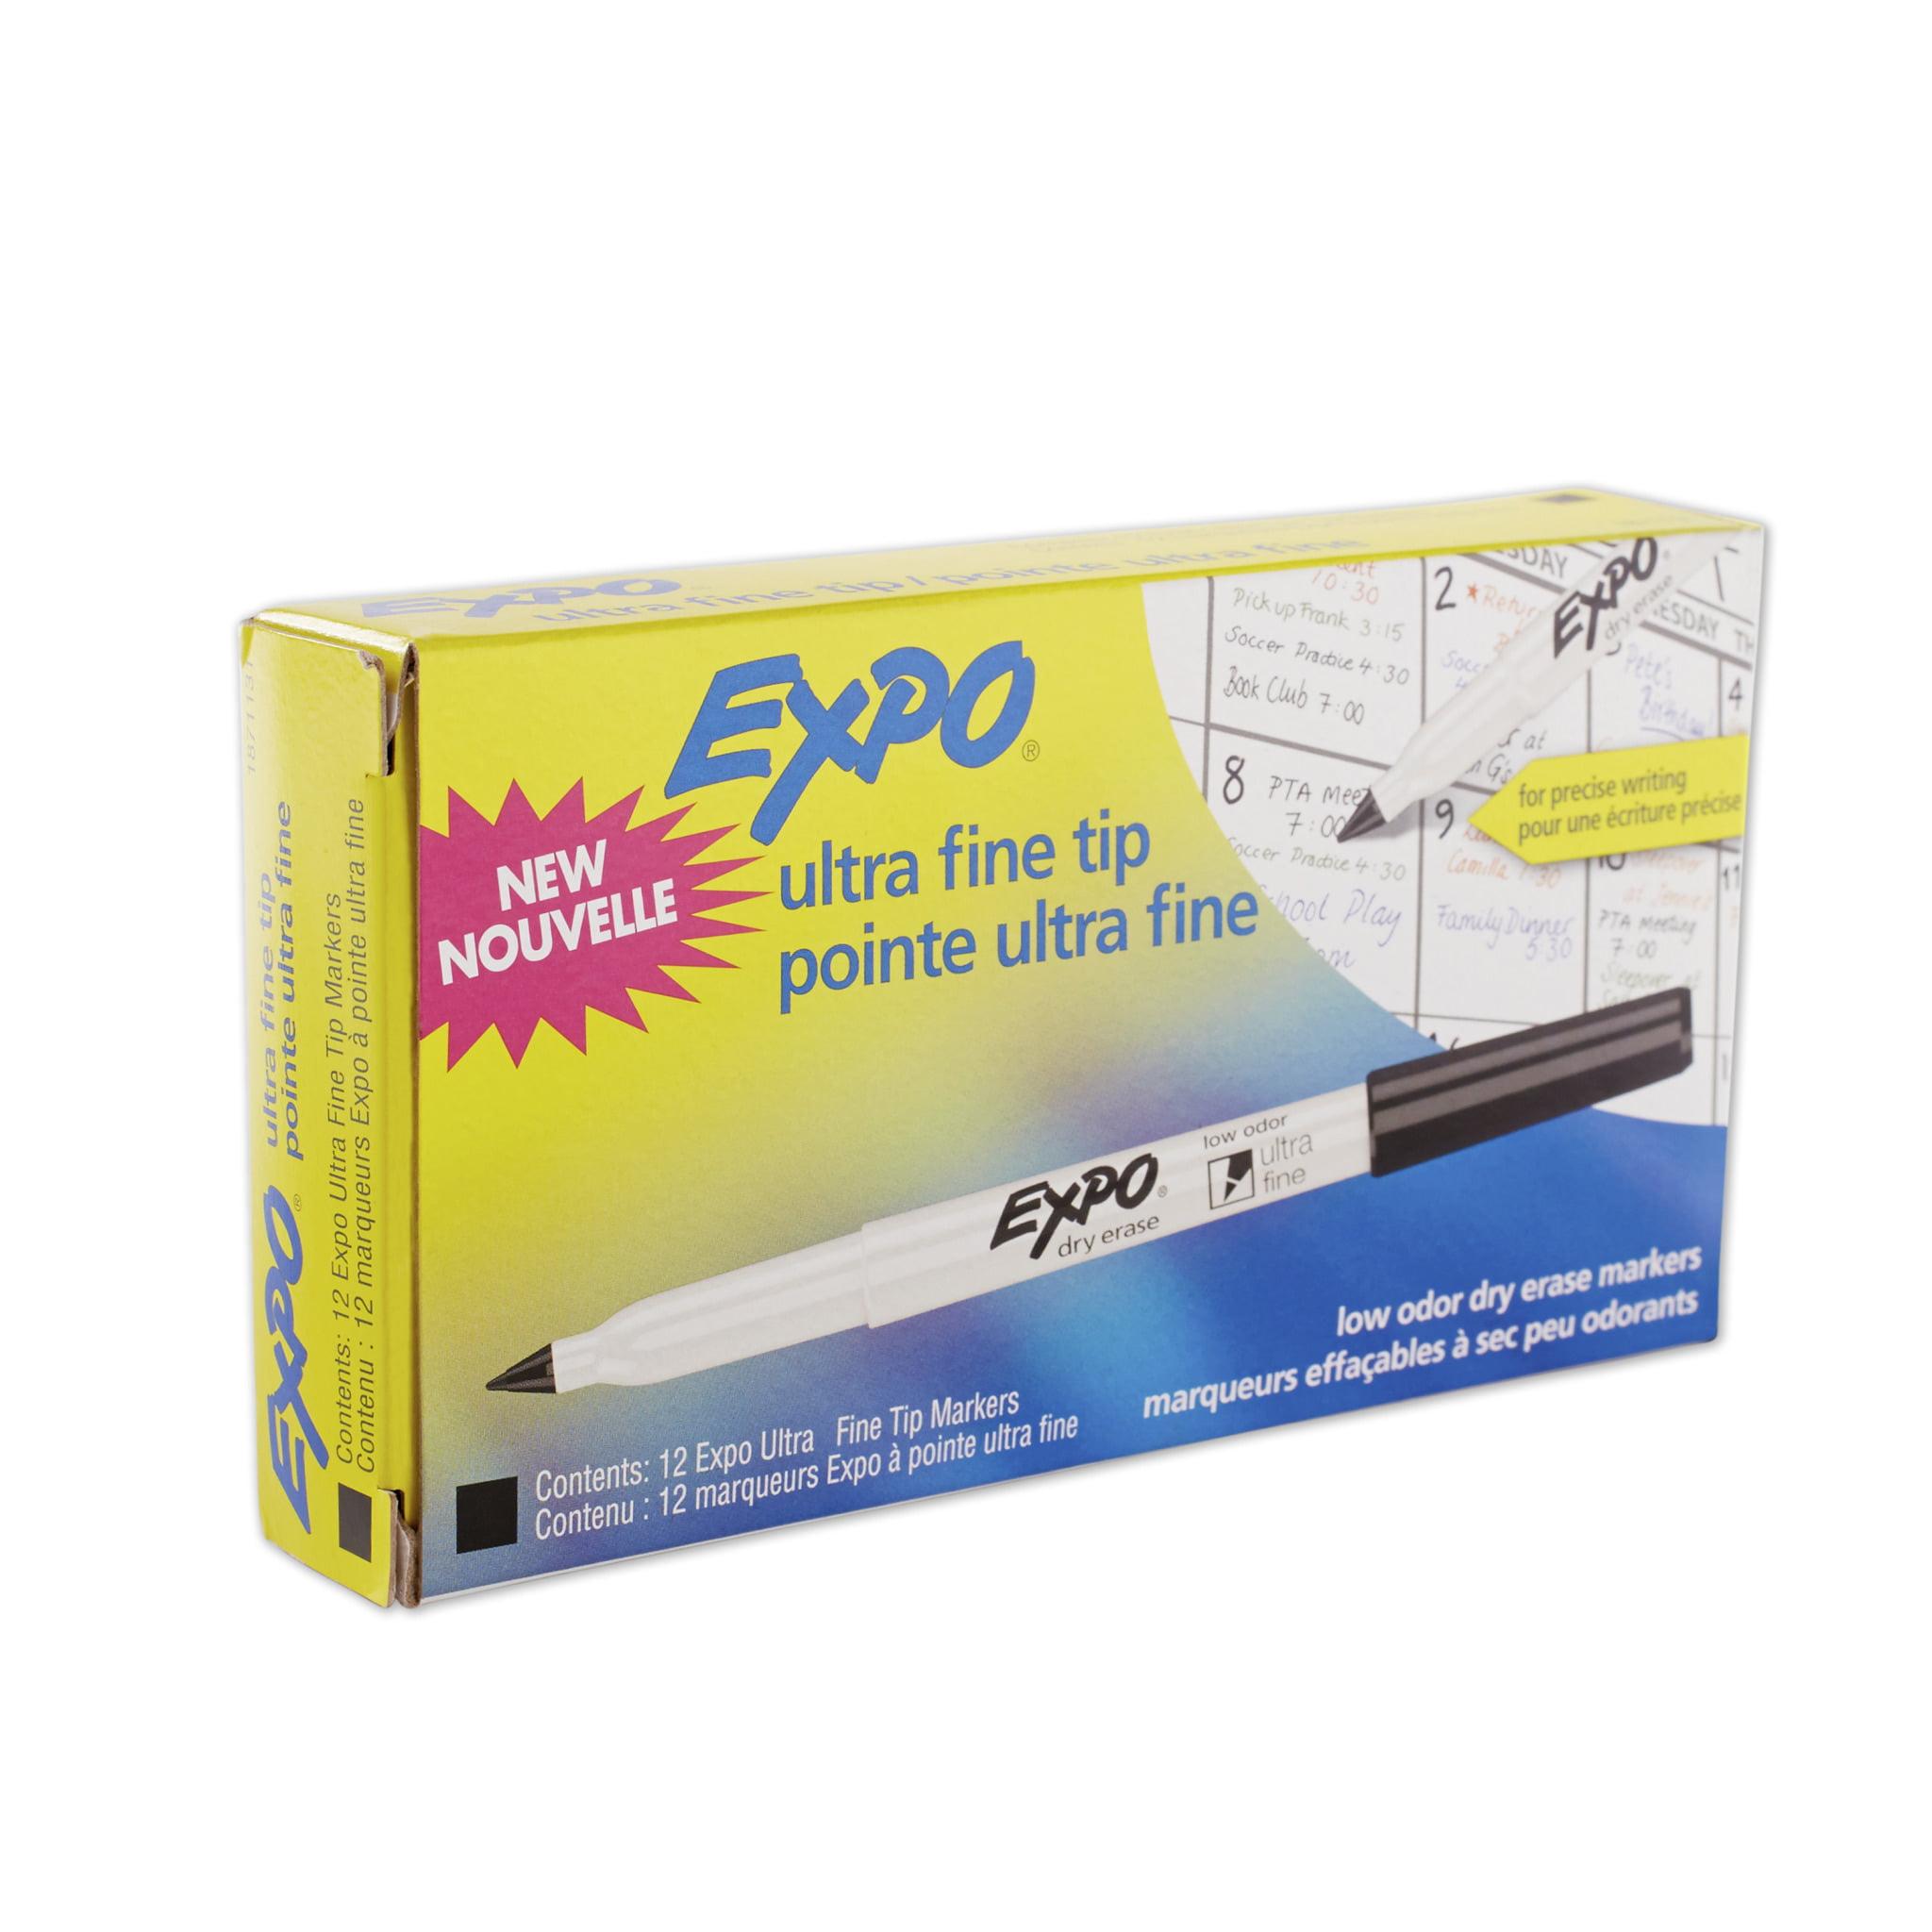 EXPO Low-Odor Dry-Erase Marker, Ultra Fine Point, Black, Dozen